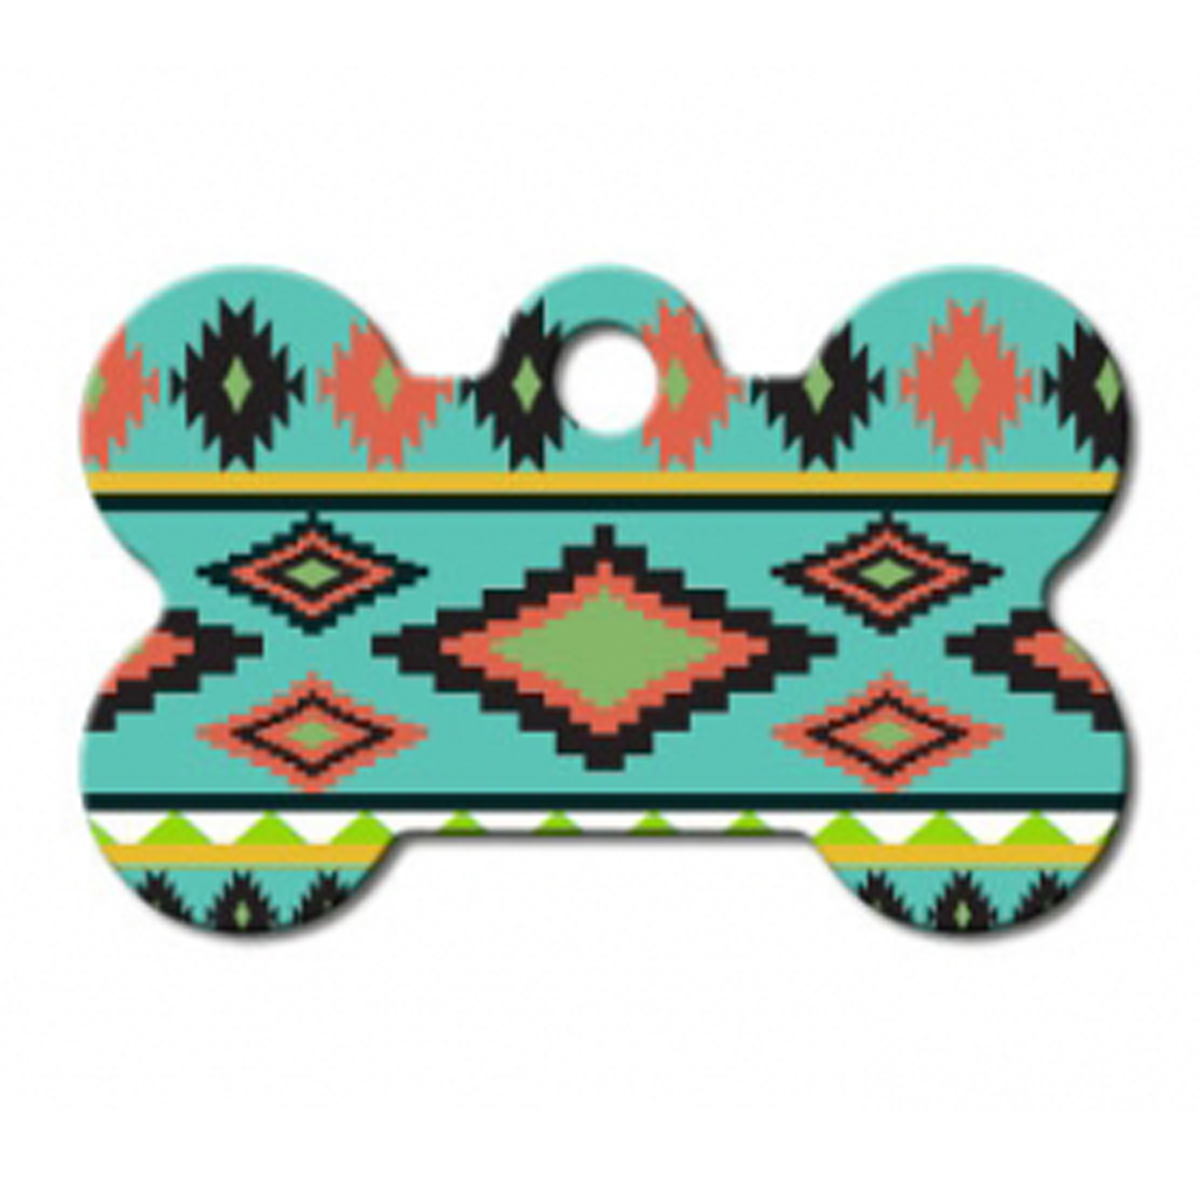 Aztec Bone Small Engravable Pet I.D. Tag - Multi-colored